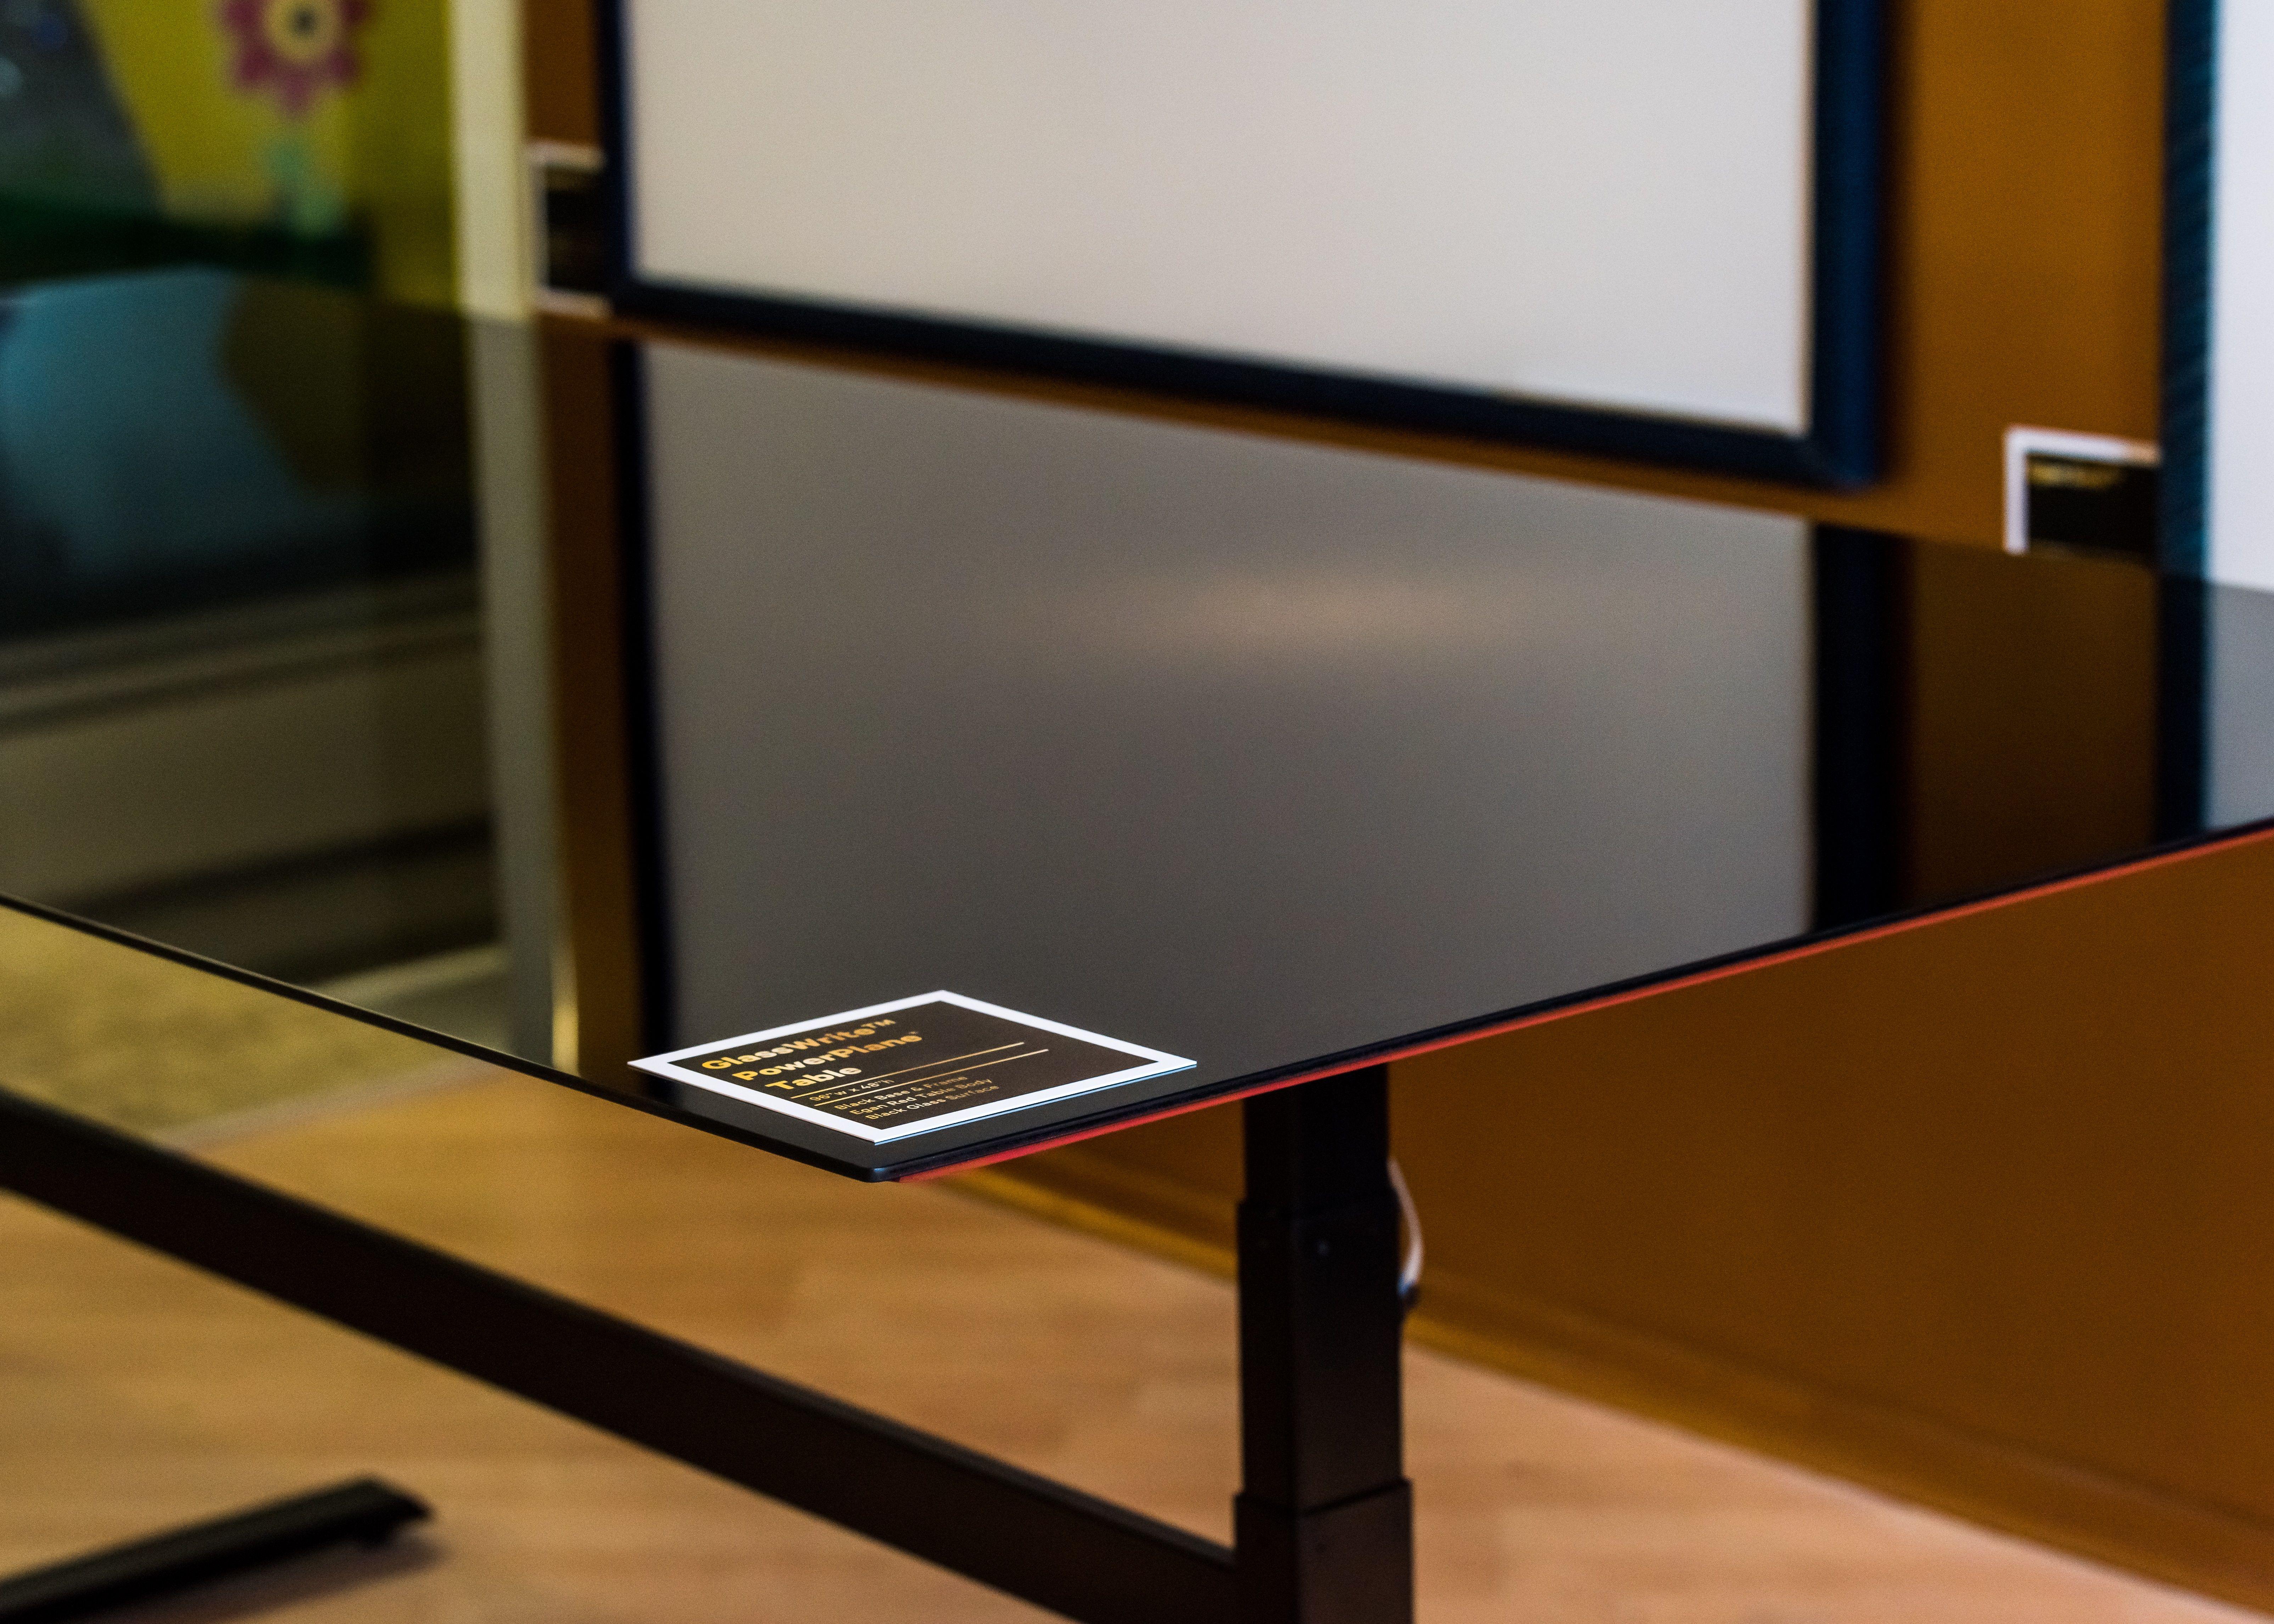 0d0e7643b7ad14e3bbea3442dbd8e6f2 Incroyable De Table Basse Ajustable Schème